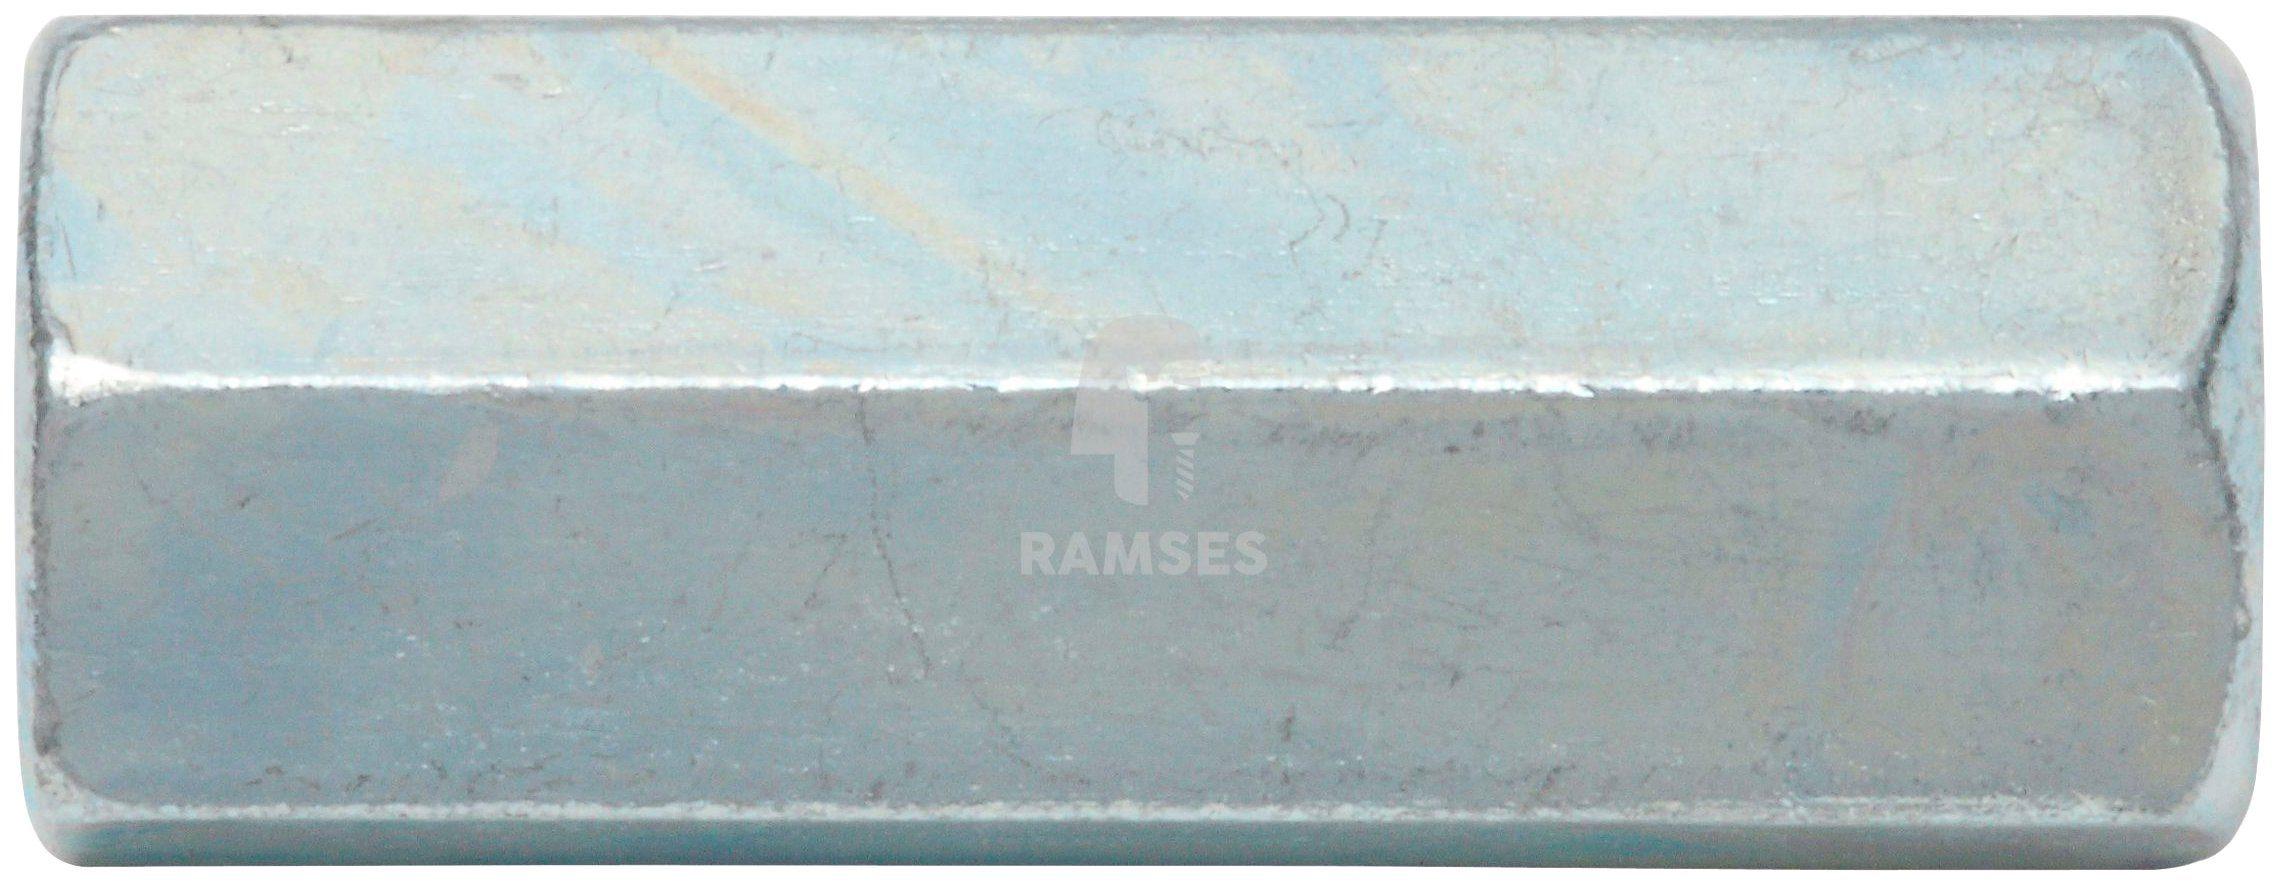 RAMSES Muffe , Sechskant Gewindemuffe M10 X 30